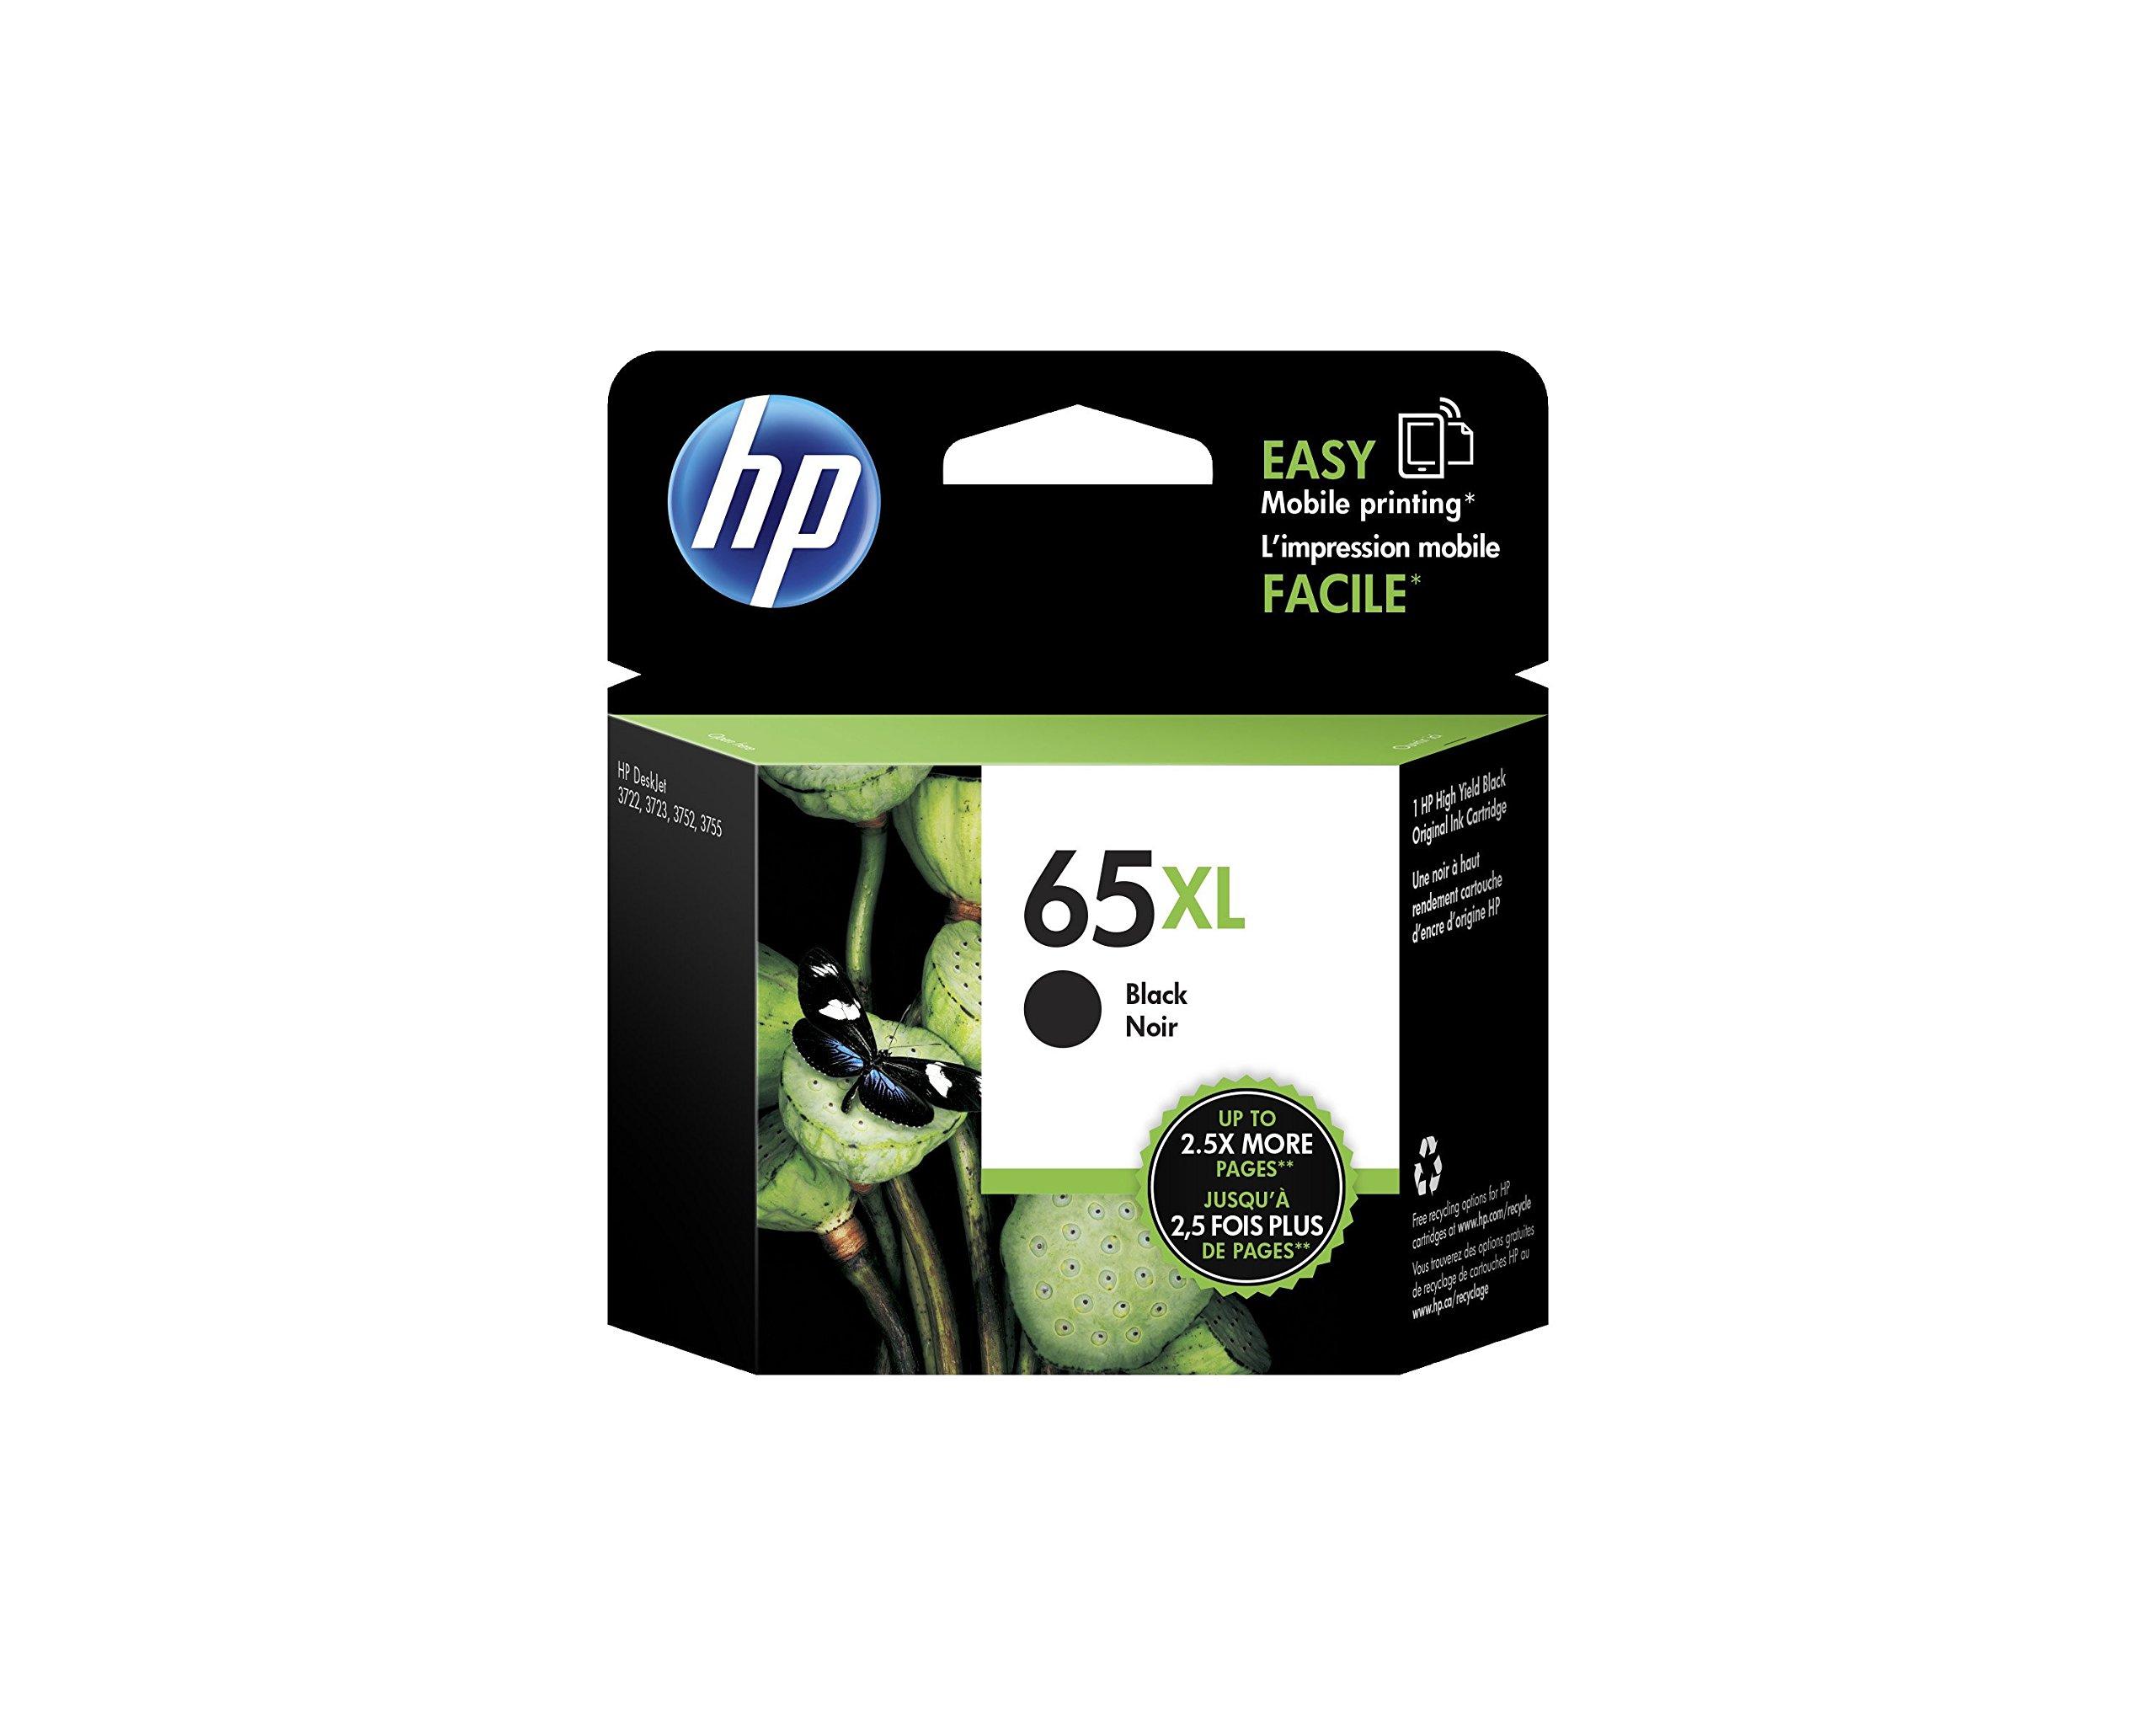 HP 65XL Black High Yield Original Ink Cartridge (N9K04AN) for HP DeskJet 2624 2652 2655 3722 3752 3755 3758